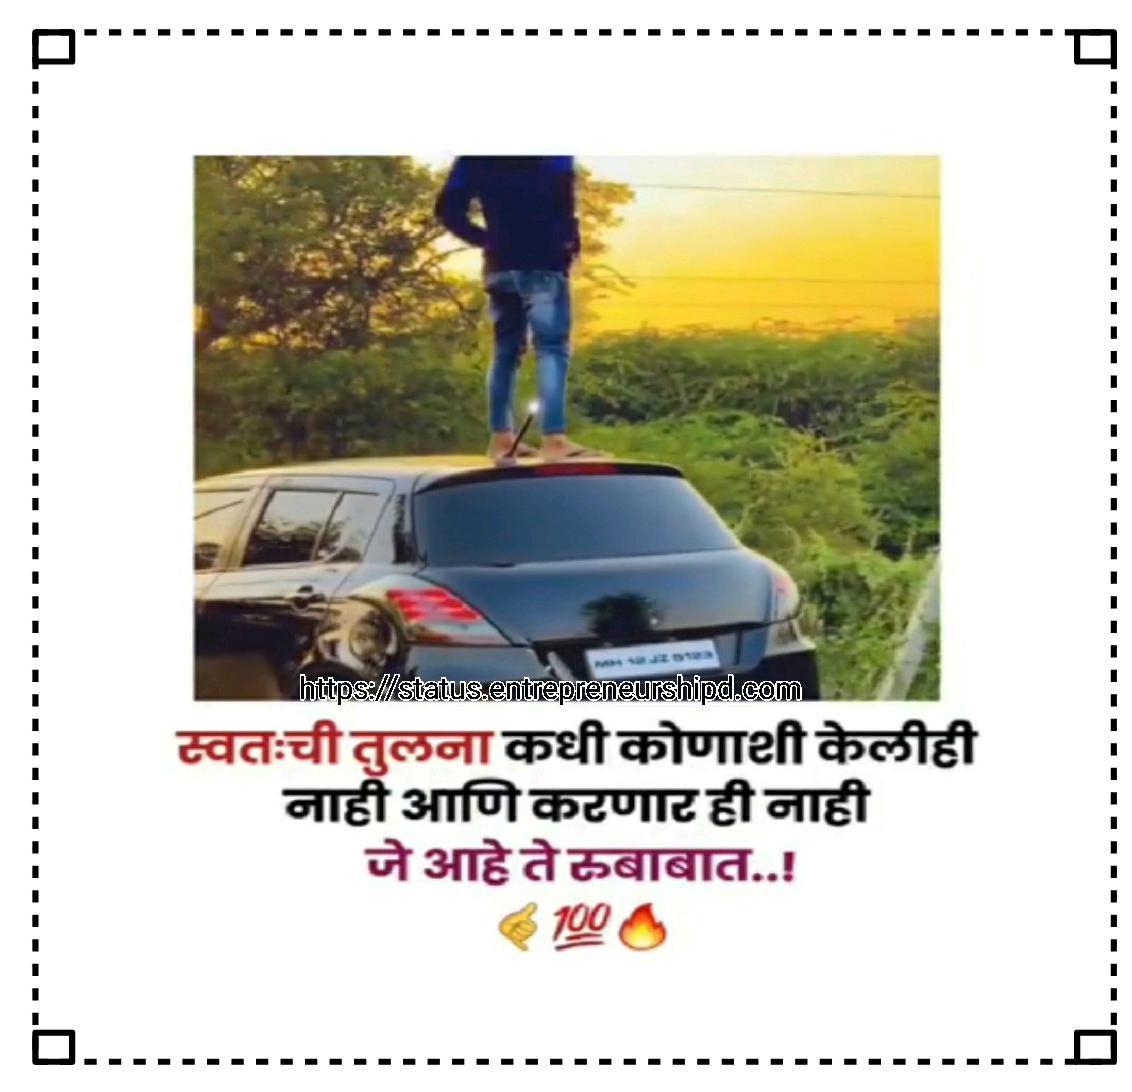 Fb marathi attitude status bhaigiri Marathi attitude status for boy text Fb marathi attitude status friendship